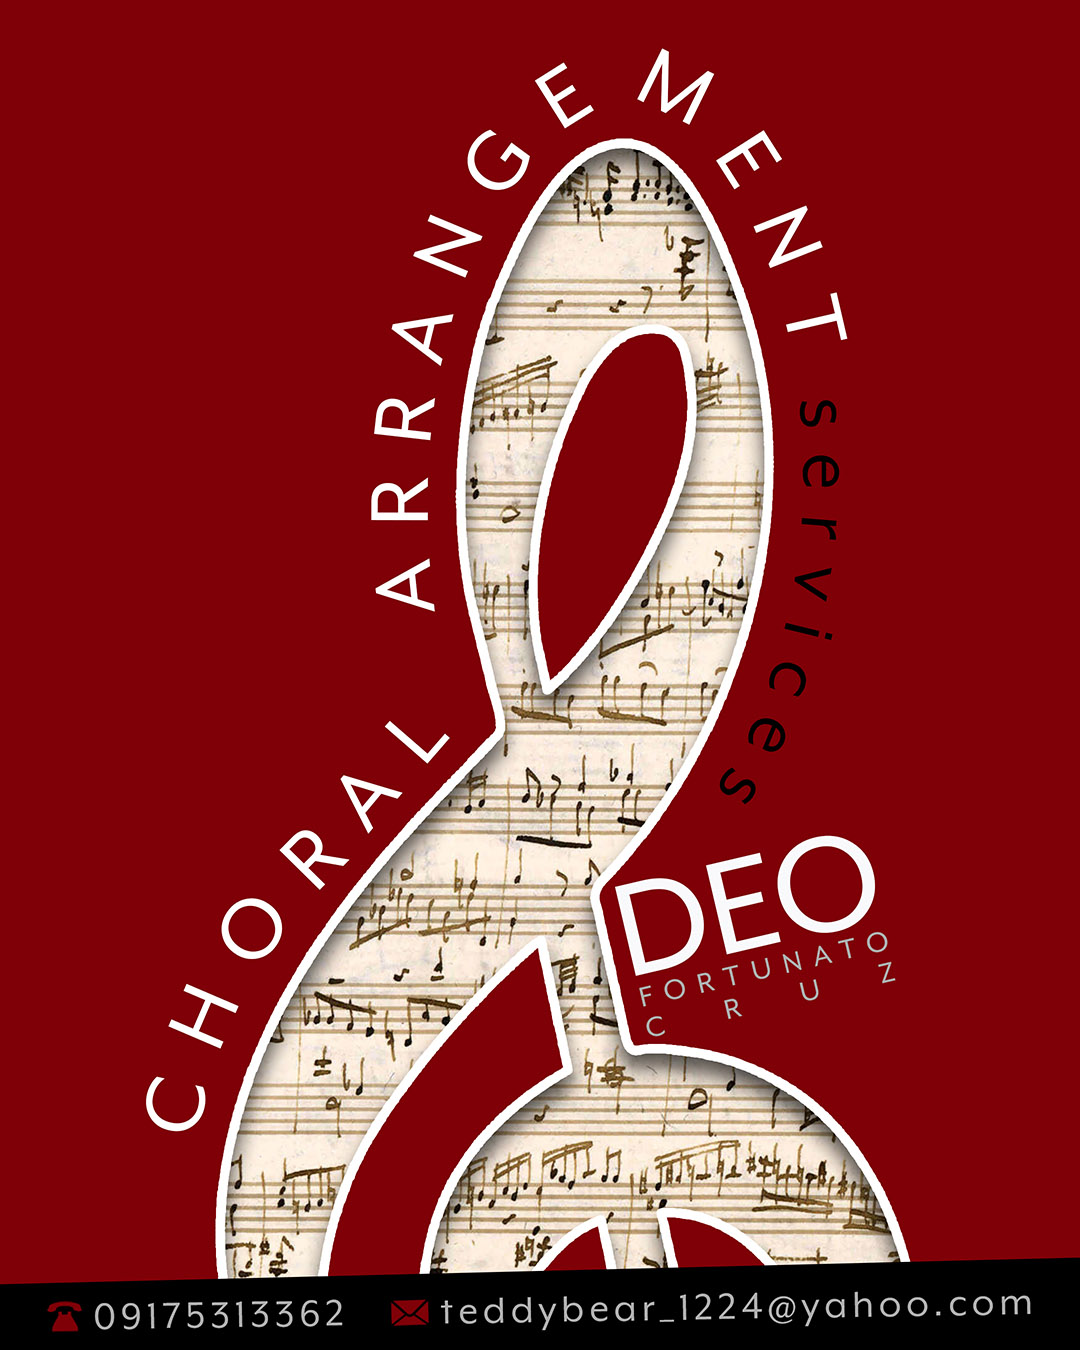 Poster: Deo choral arrangement